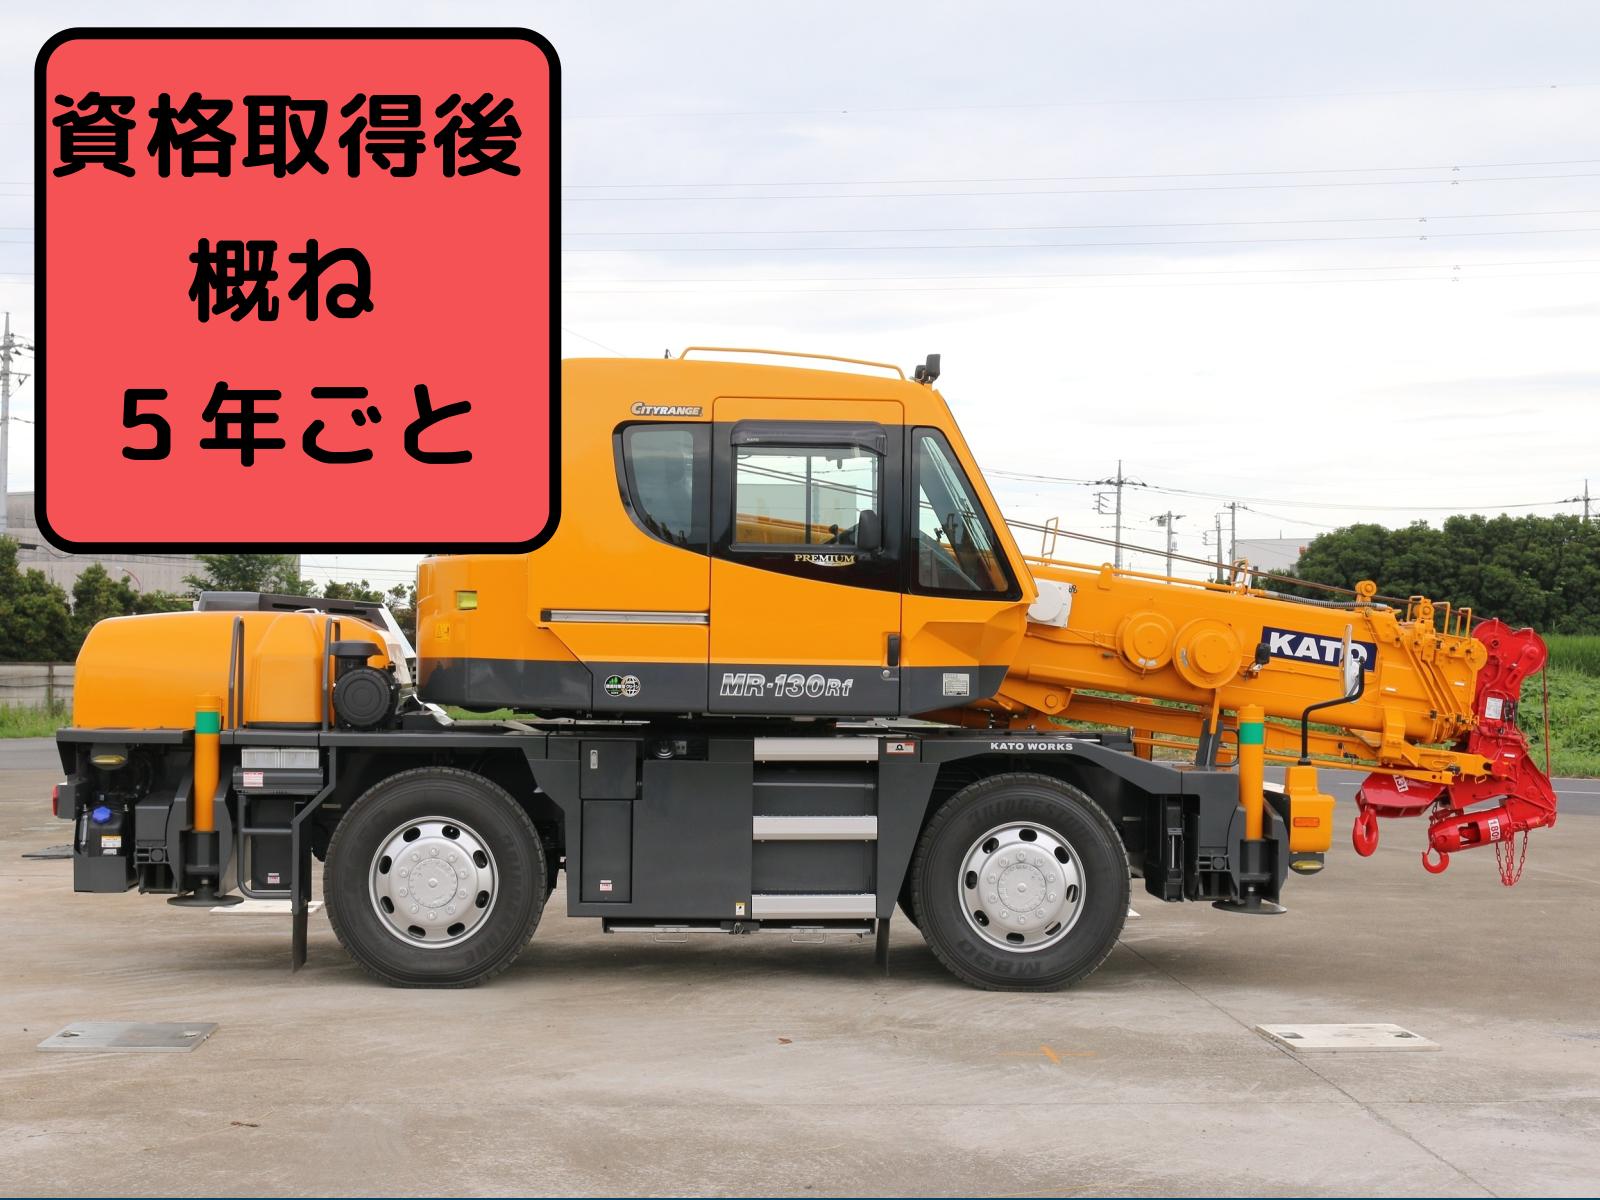 移動式クレーン運転士 安全衛生教育 加藤製作所